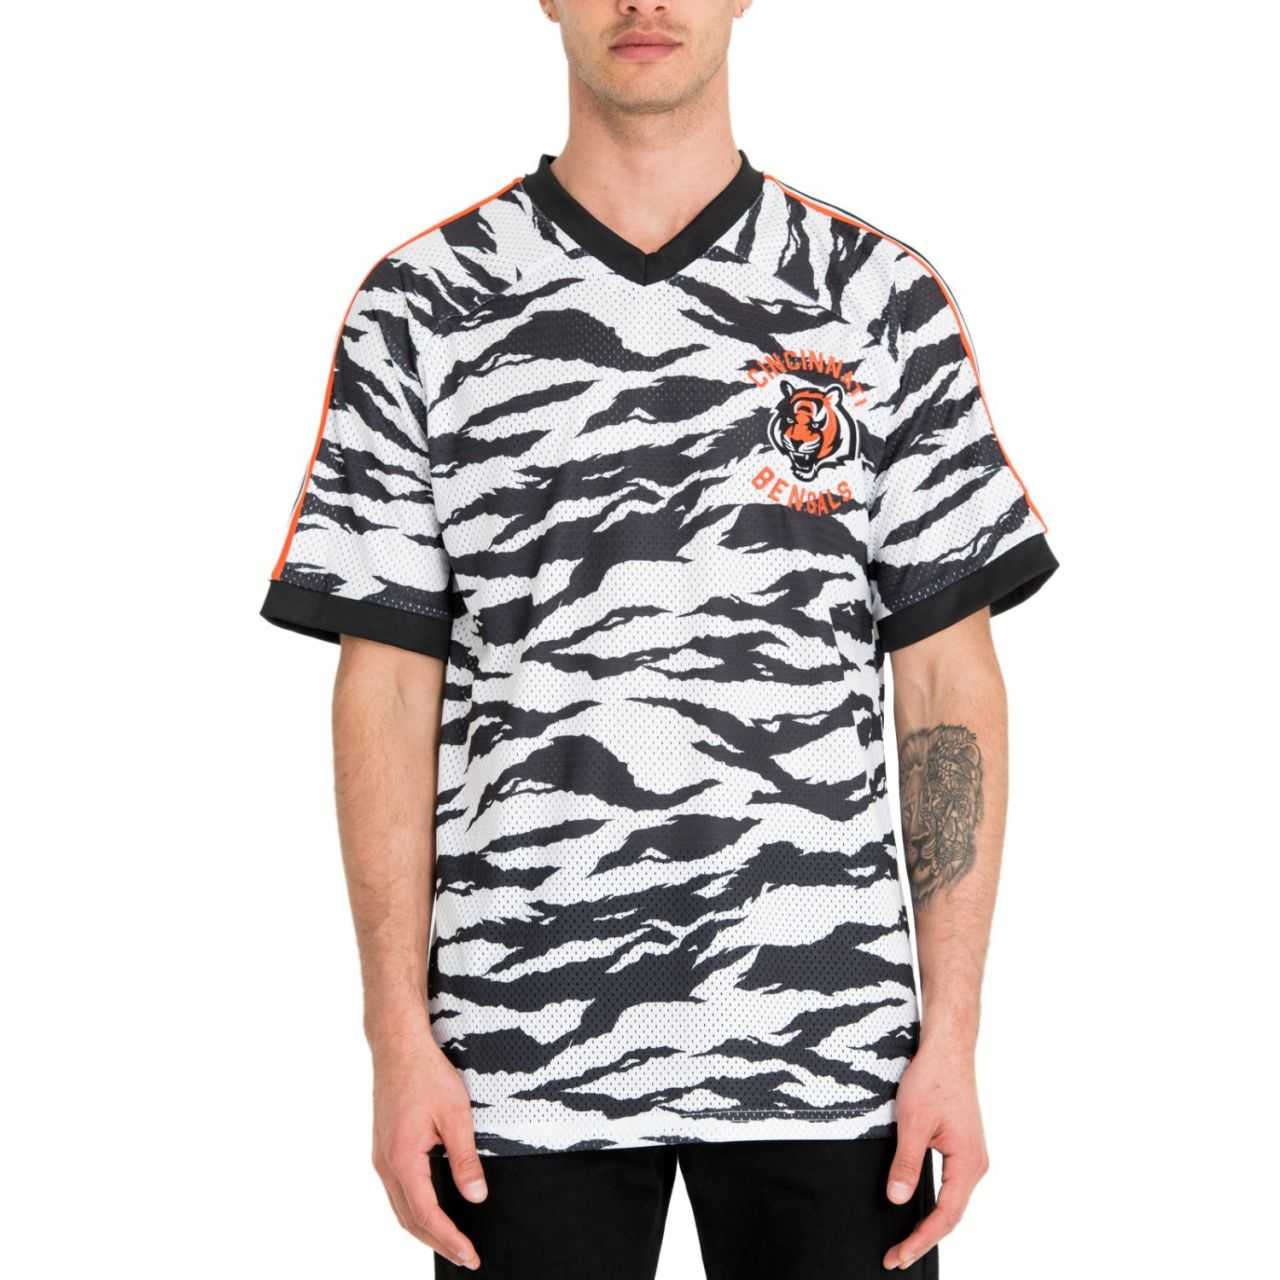 amfoo - New Era NFL Jersey Mesh Shirt - Cincinnati Bengals